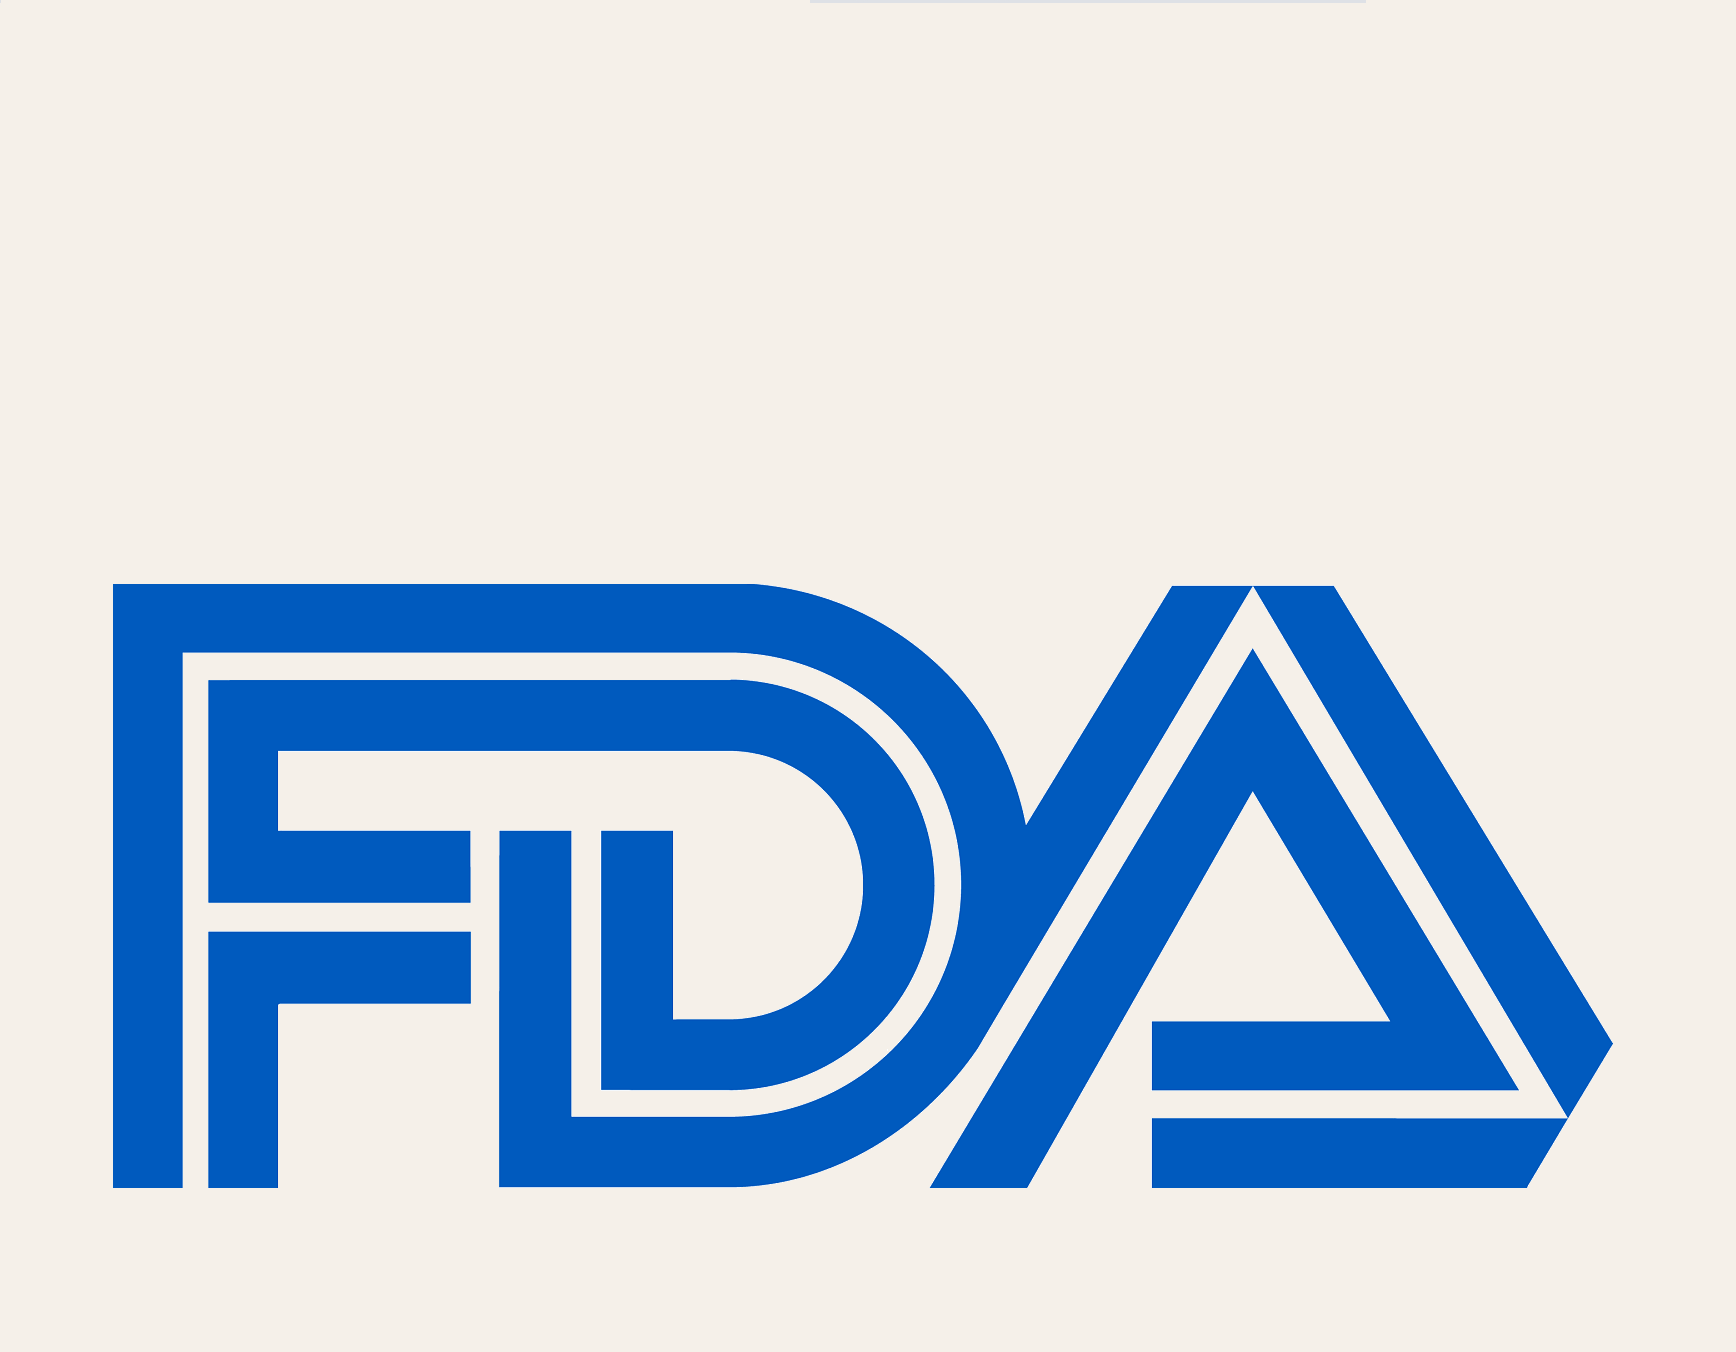 FDA Final